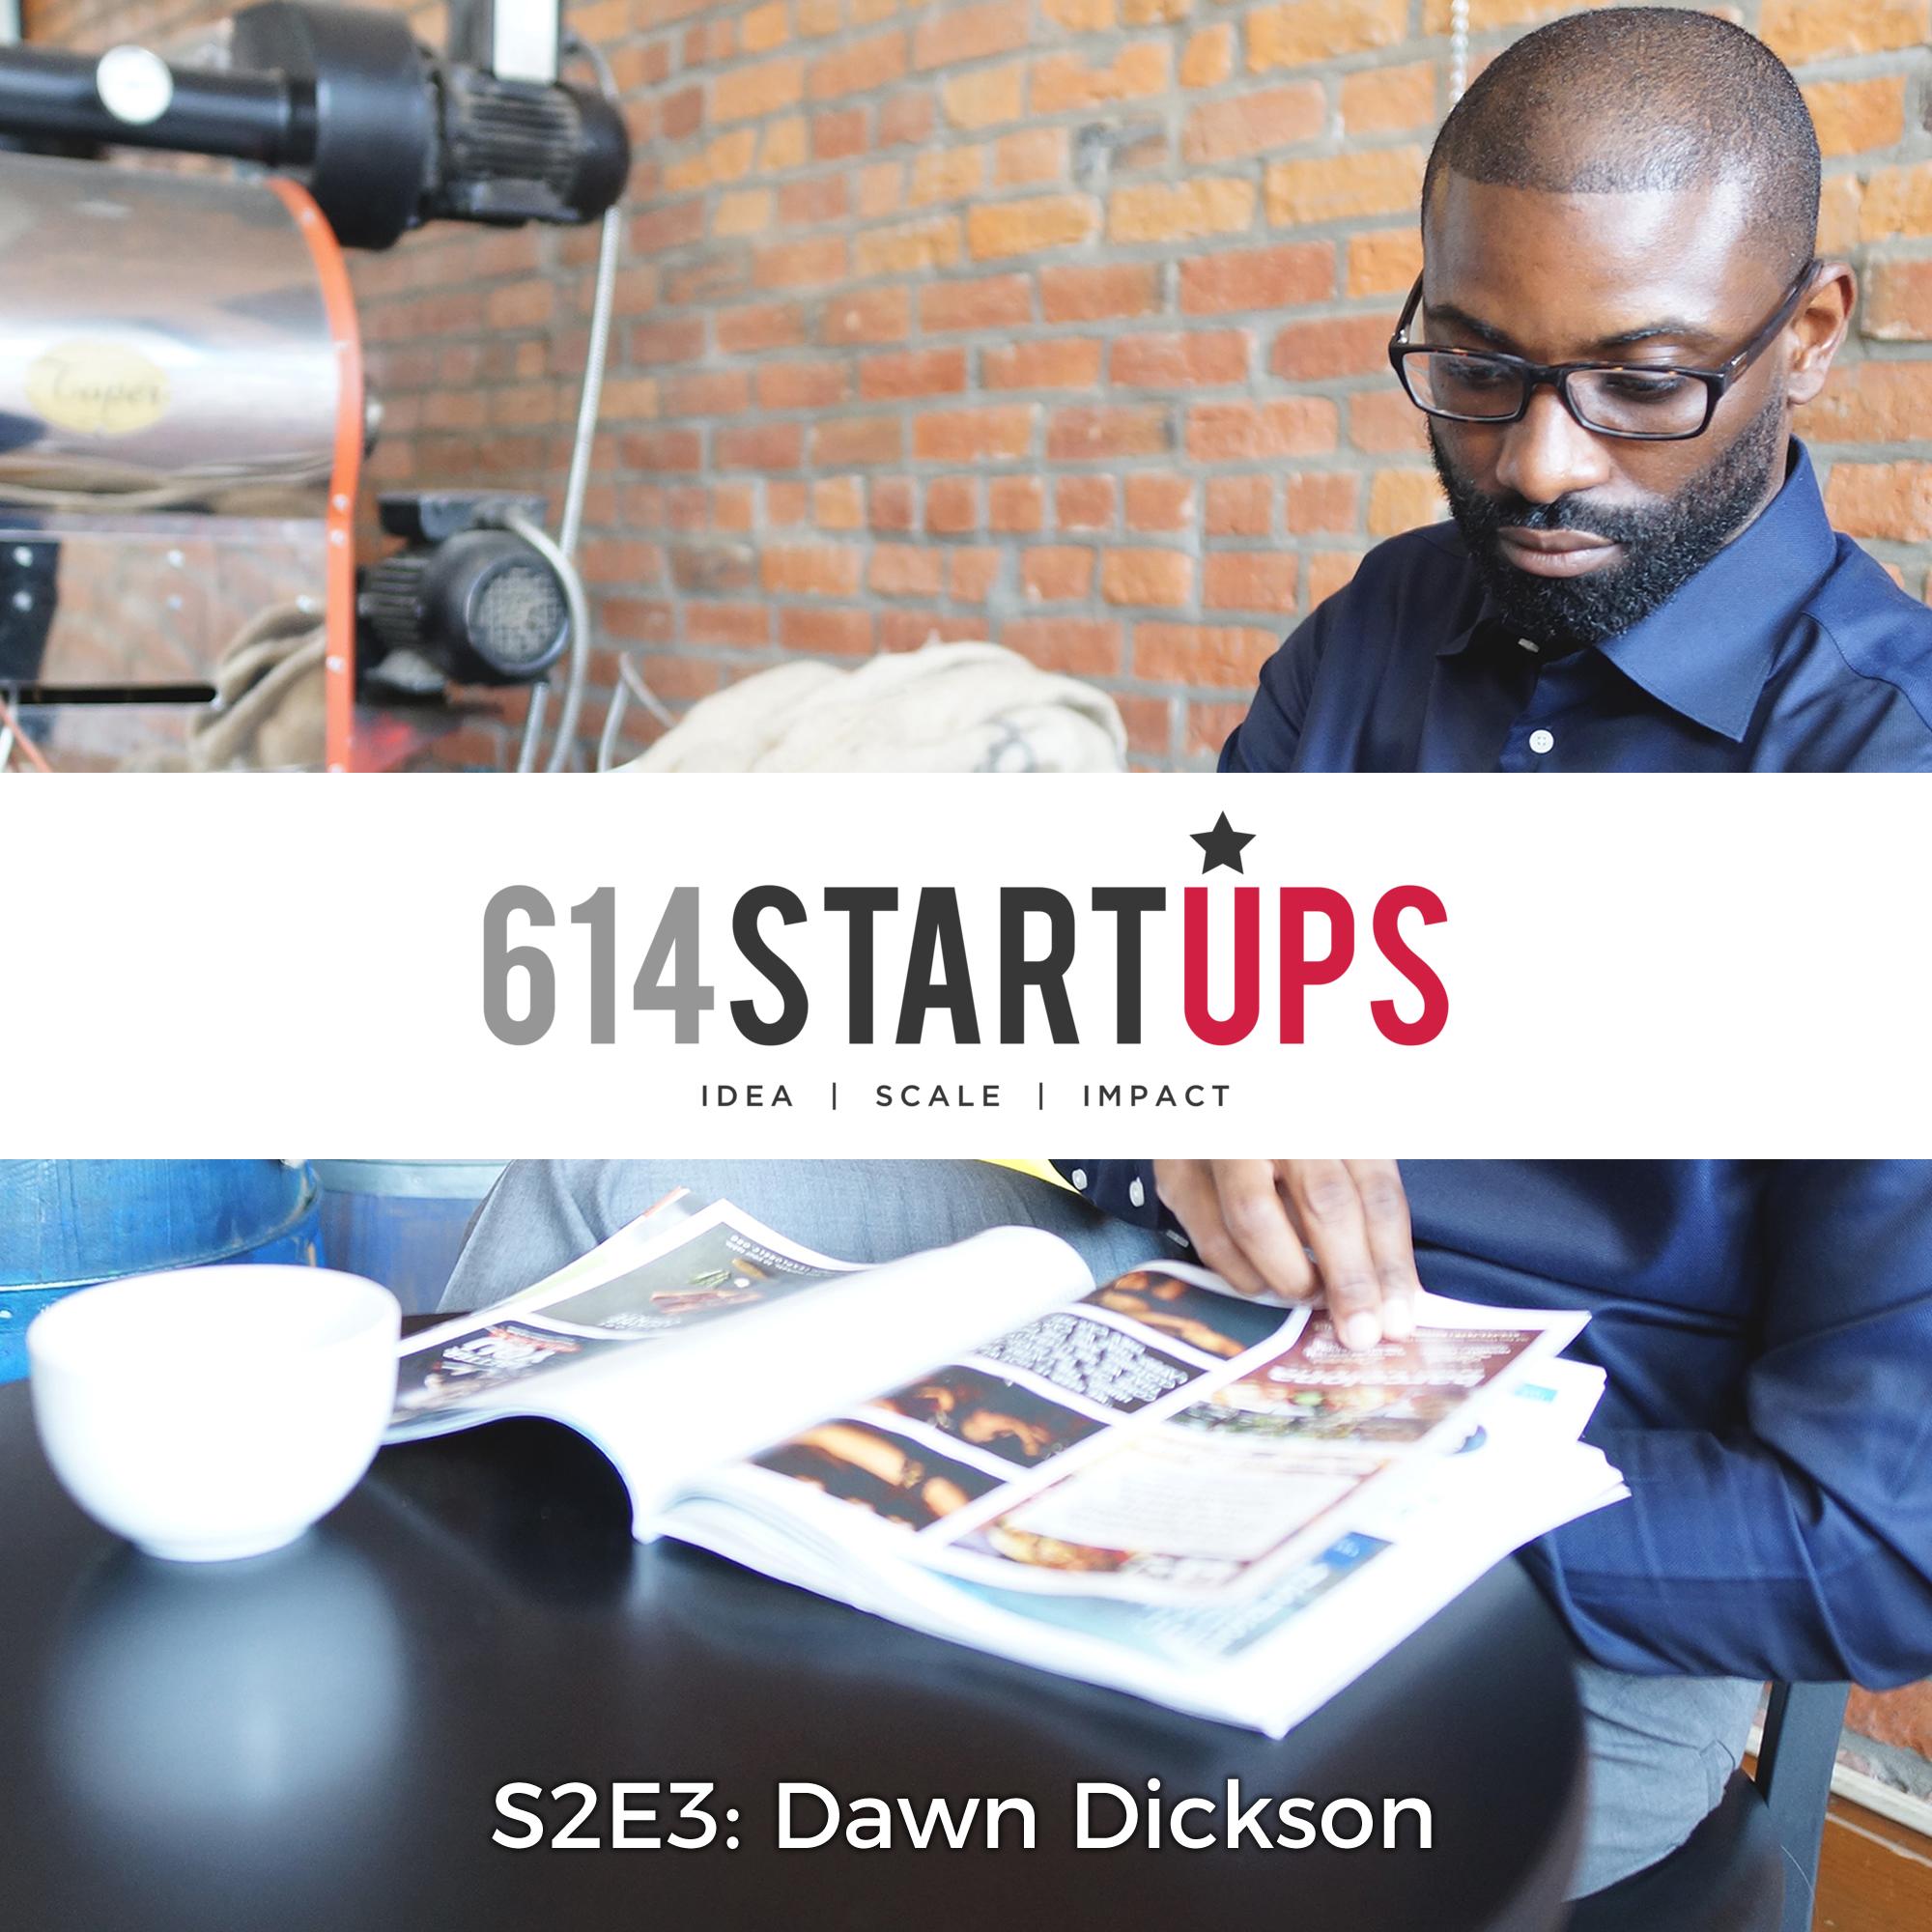 614SU - S2E3 - Dawn Dickson.jpg